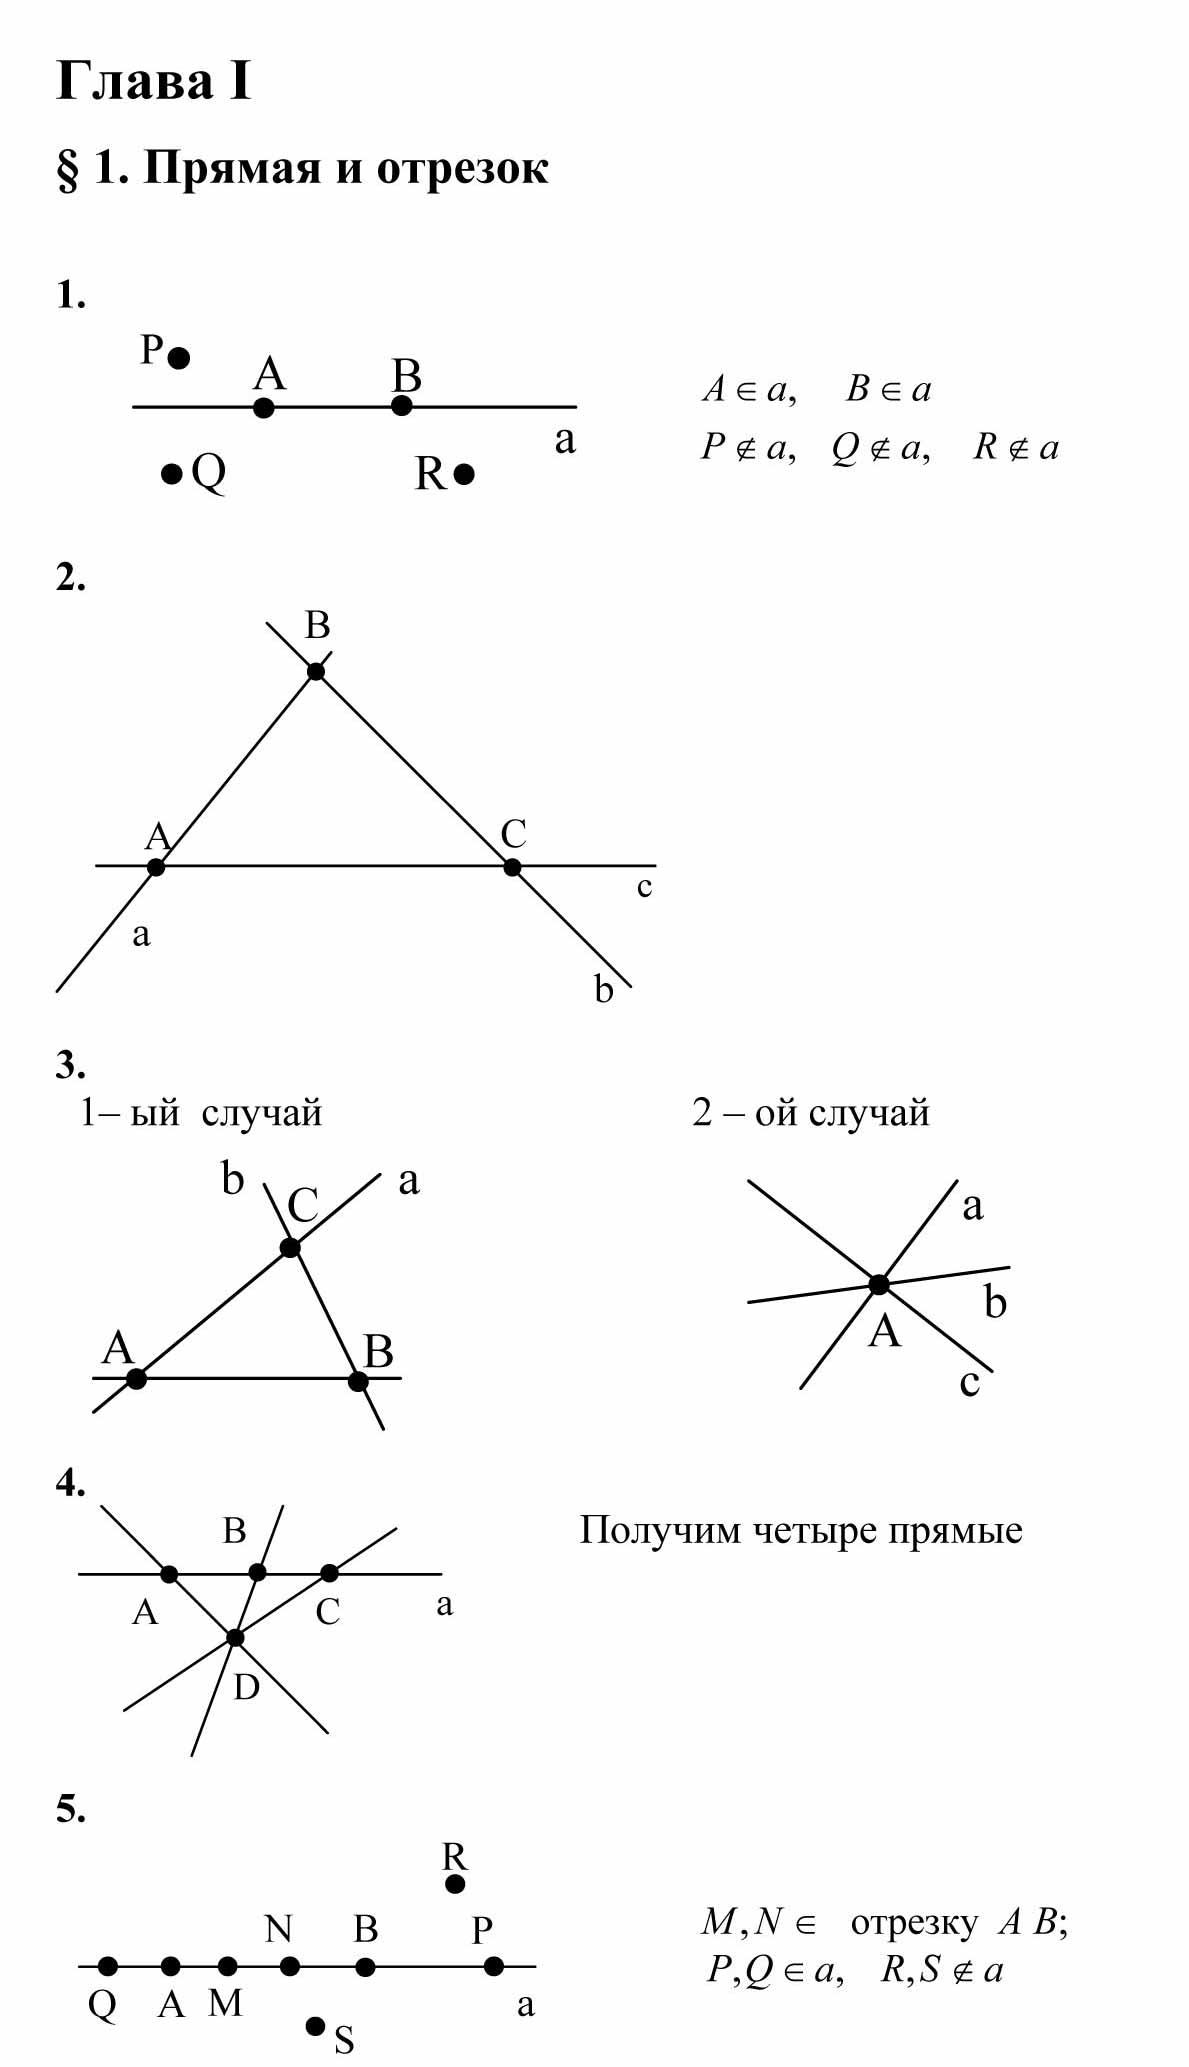 решебник по Геометрии класс к учебнику Атанасяна класс  Решебник